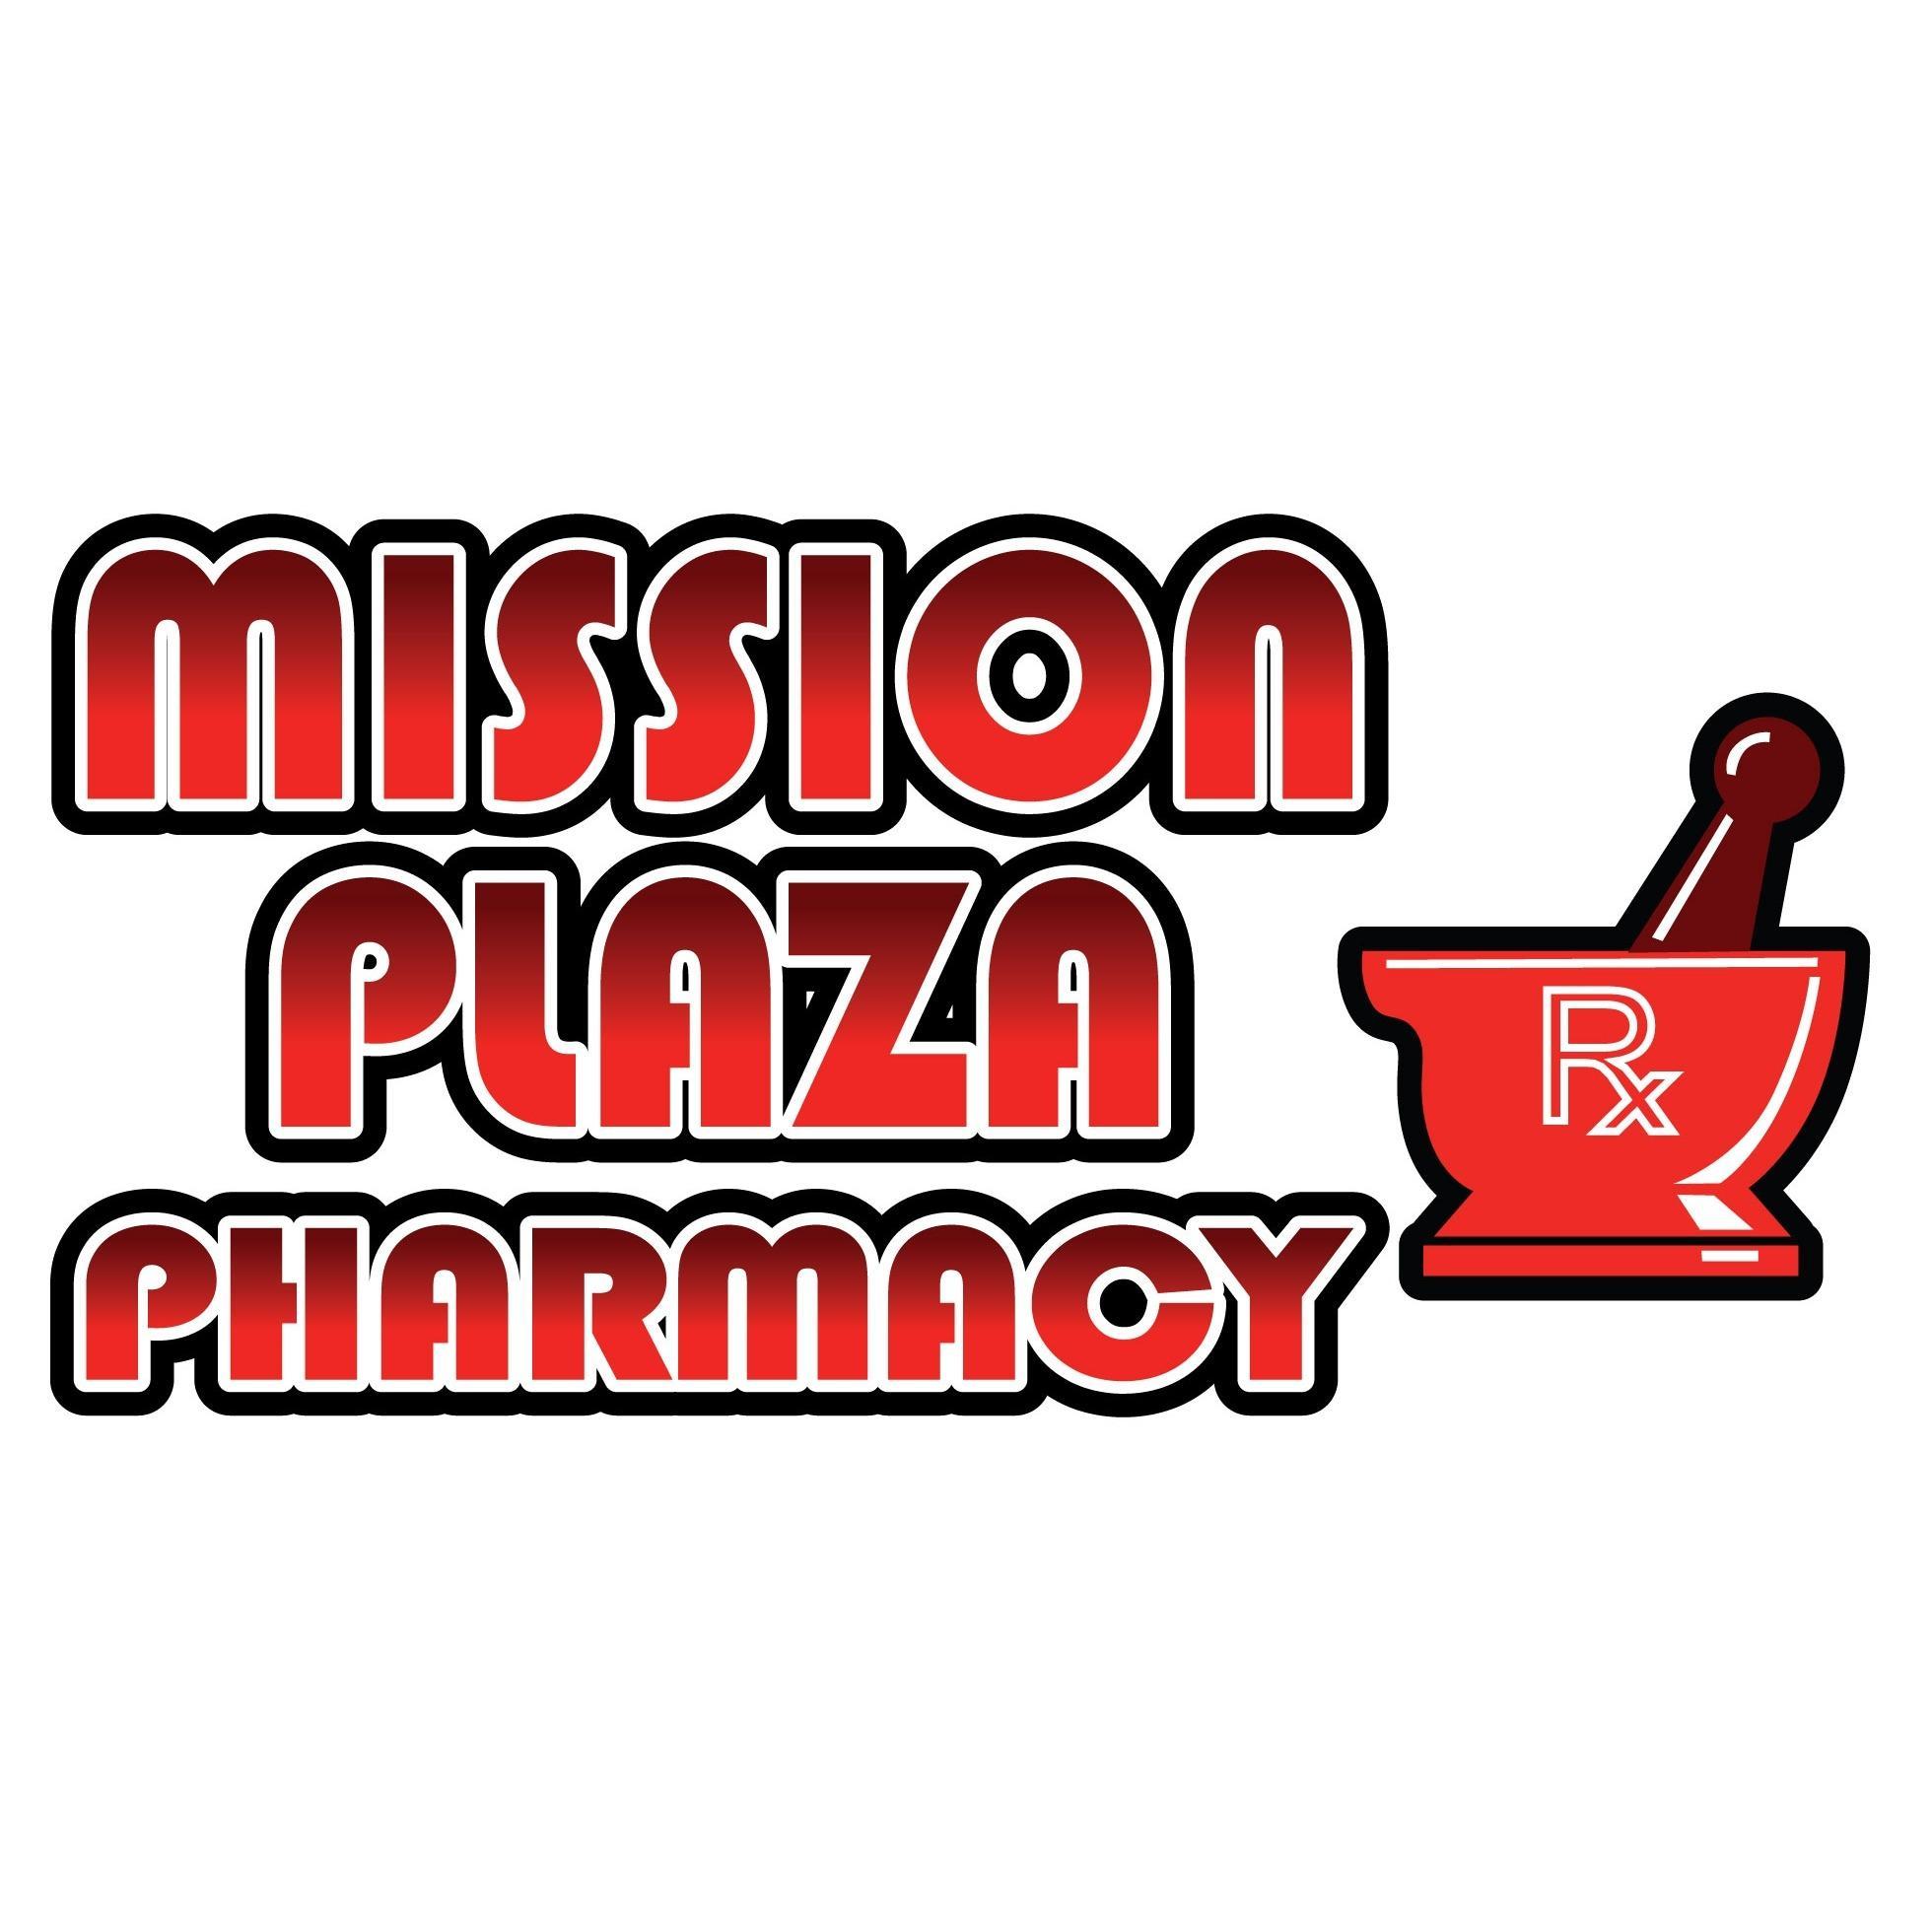 Mission Plaza Pharmacy - Mission, TX - Pharmacist